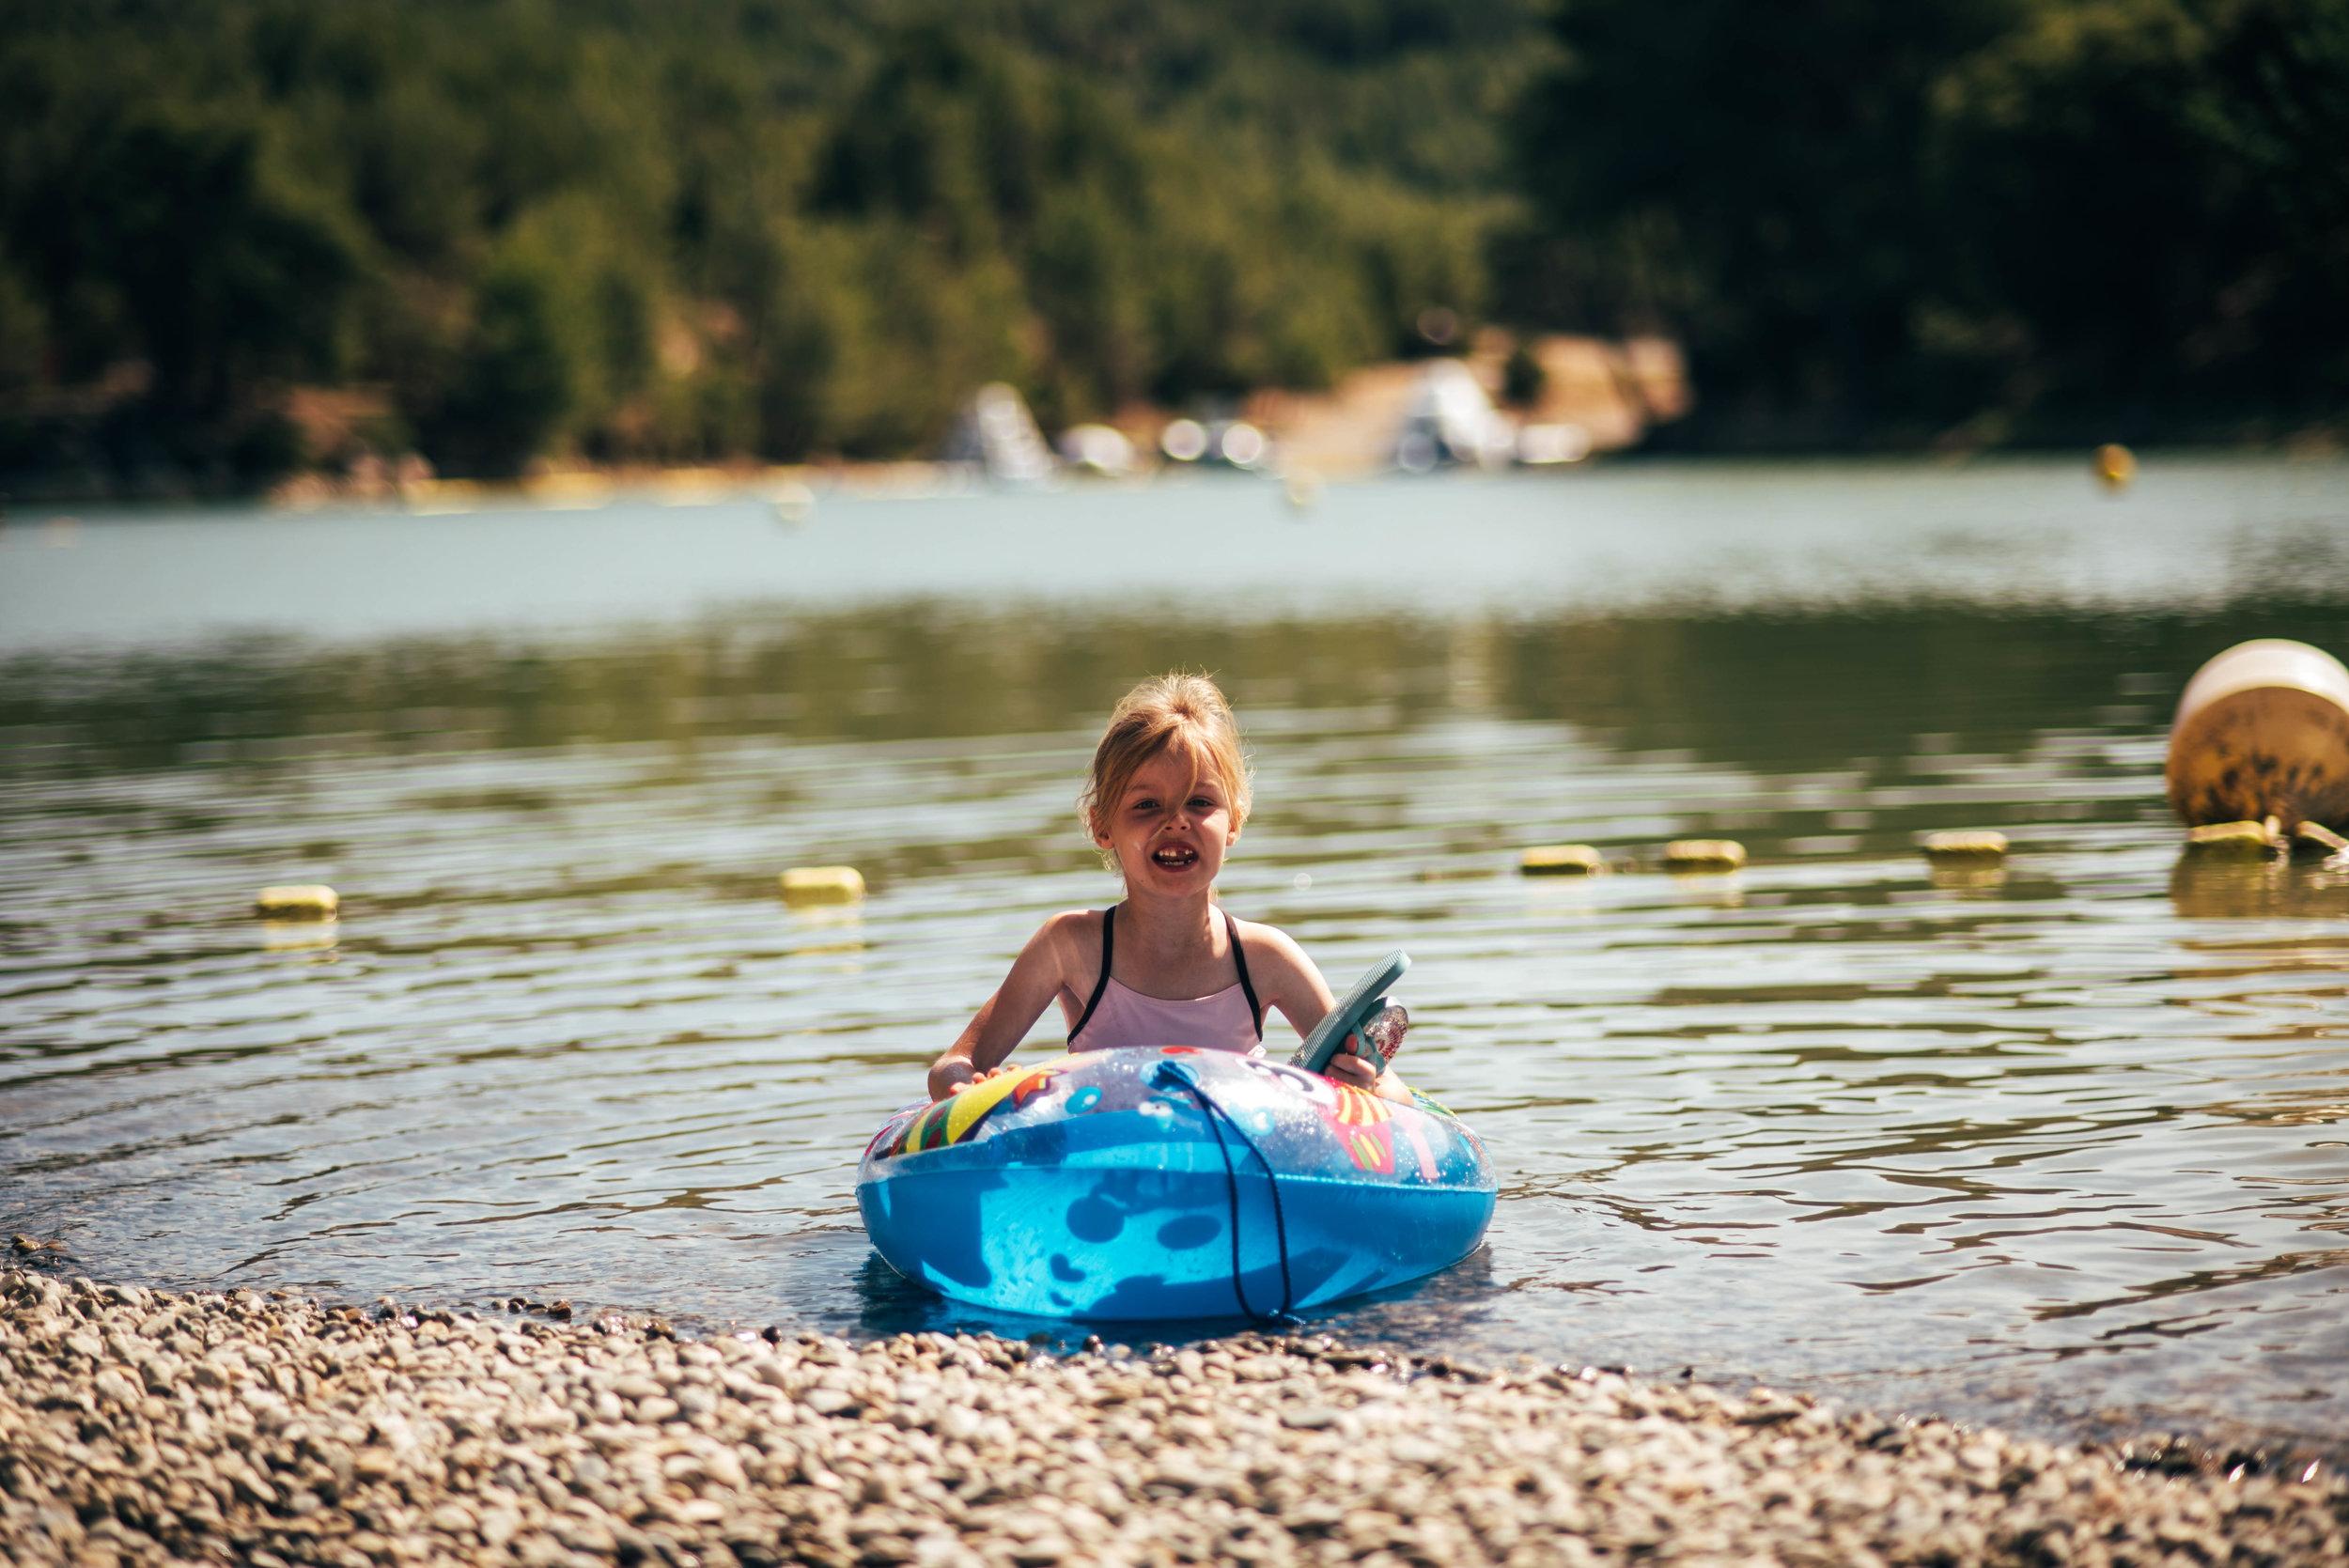 Little girl in boat on lake Essex uK Documentary Portrait Photographer